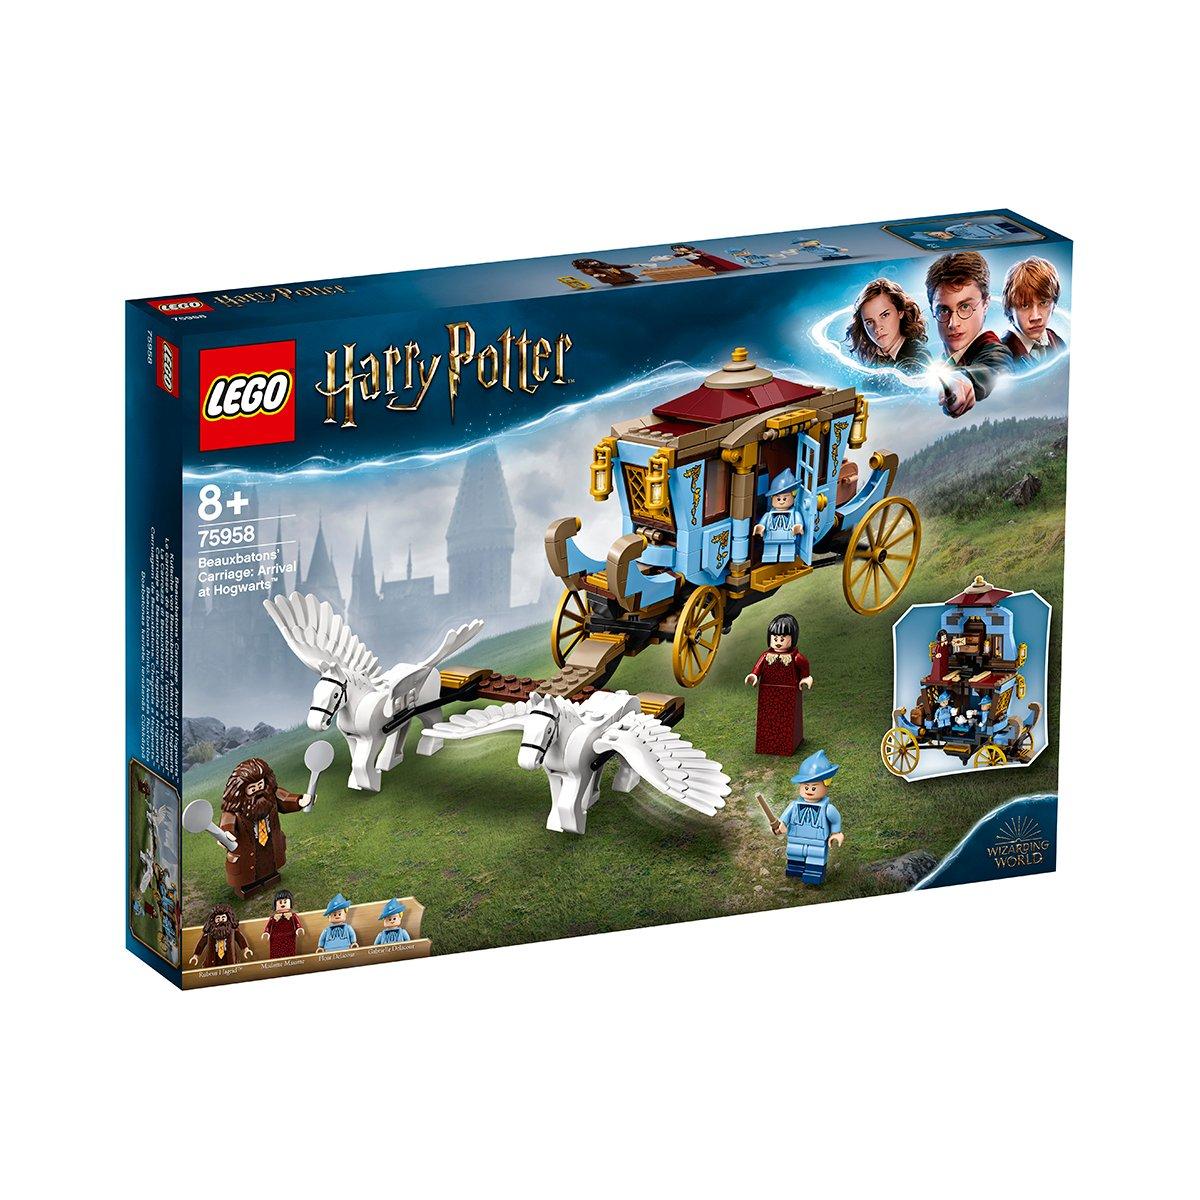 LEGO® Harry Potter™ - Trasura lui Beauxbatons sosire la Hogwarts (75958)